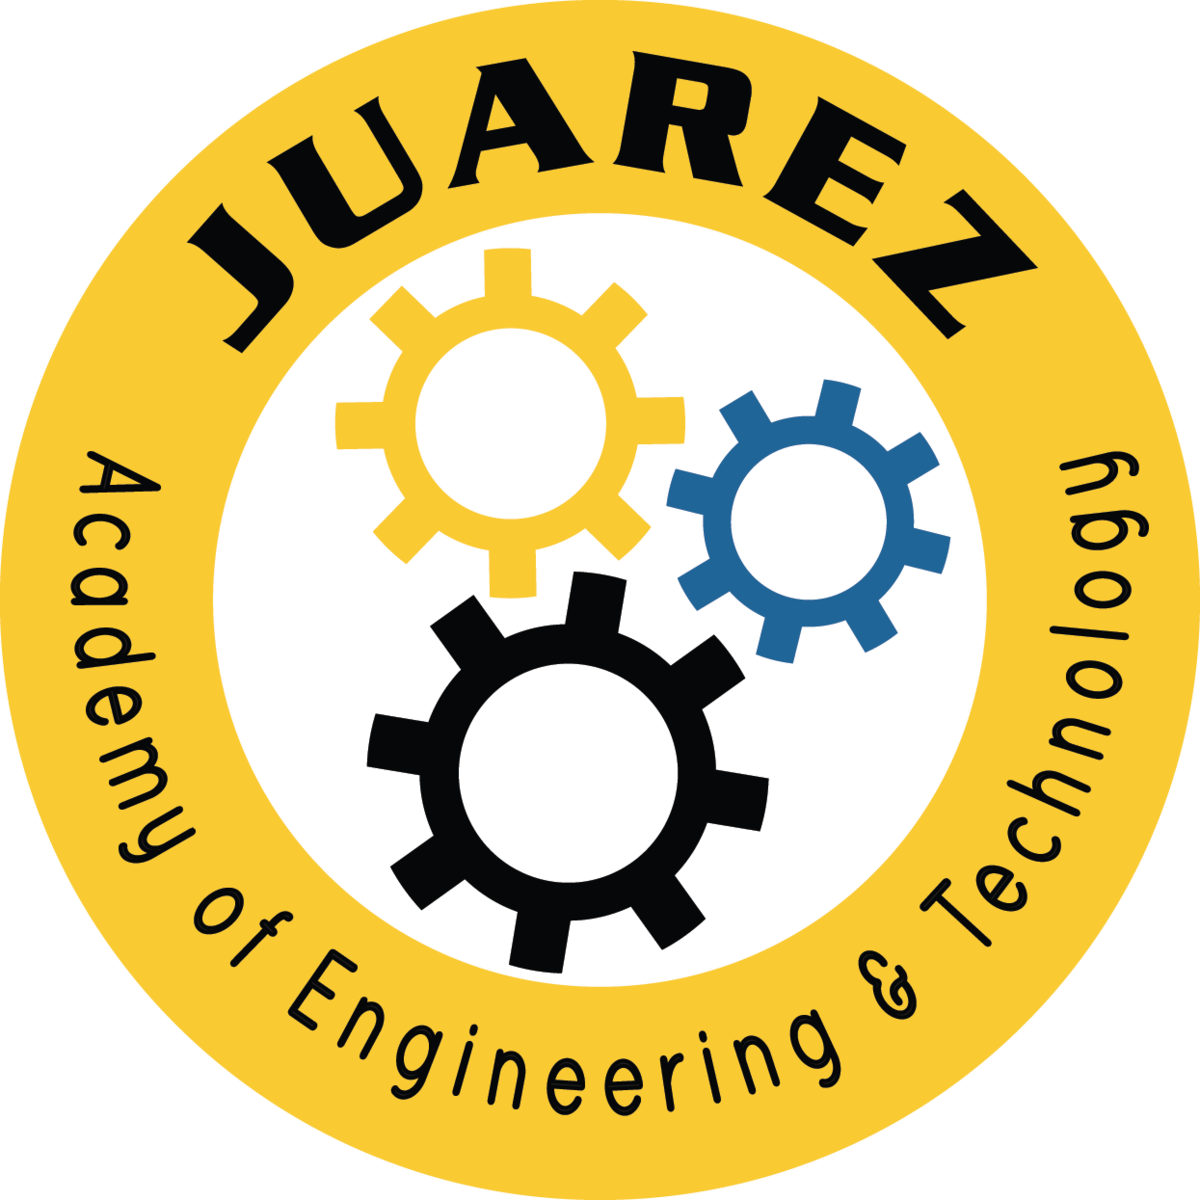 Juarez Es logo